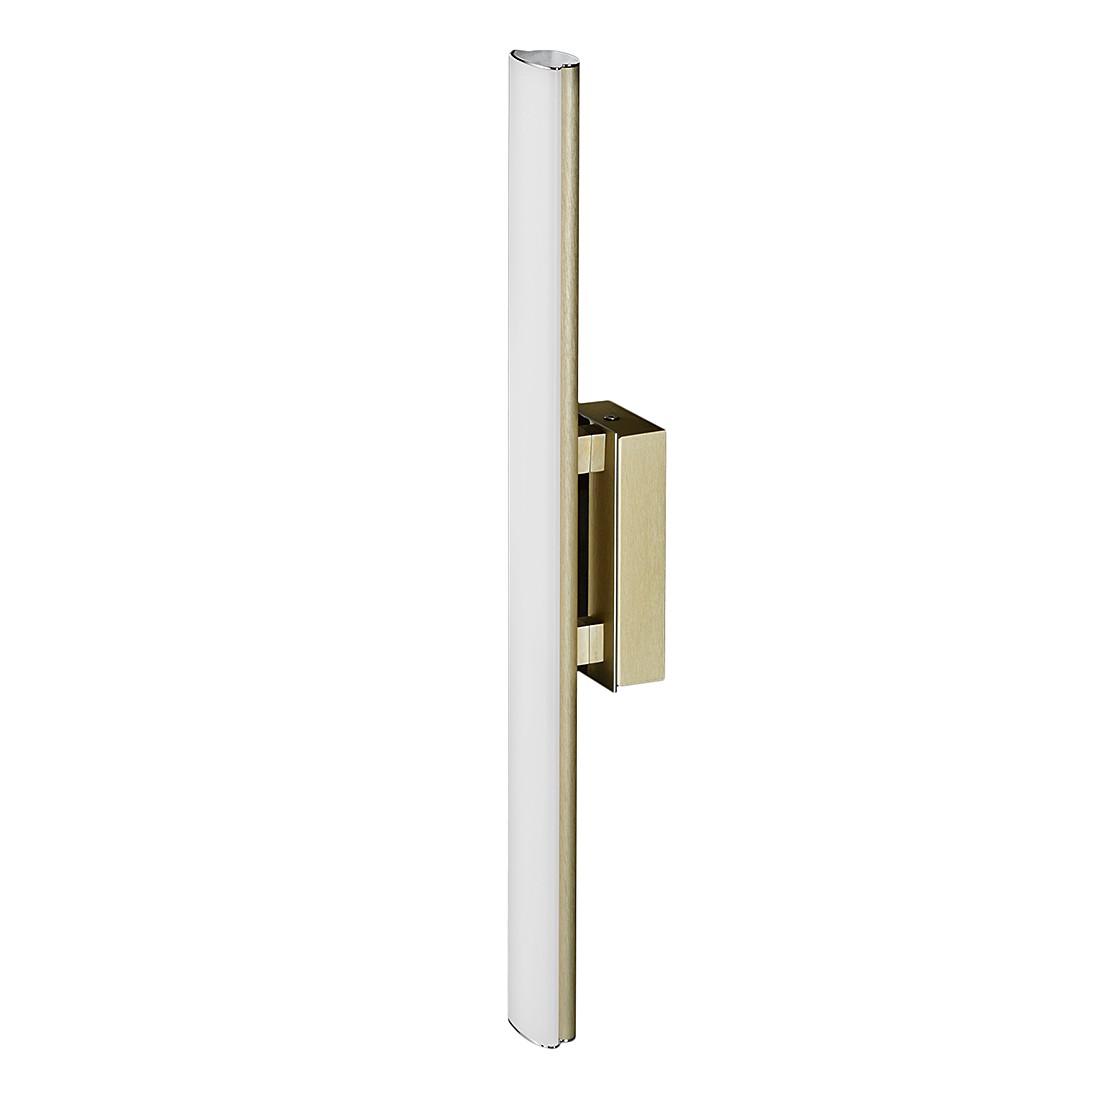 Wandleuchte VENTA ● Metall/Kunststoff ● Gold- Helestra A+